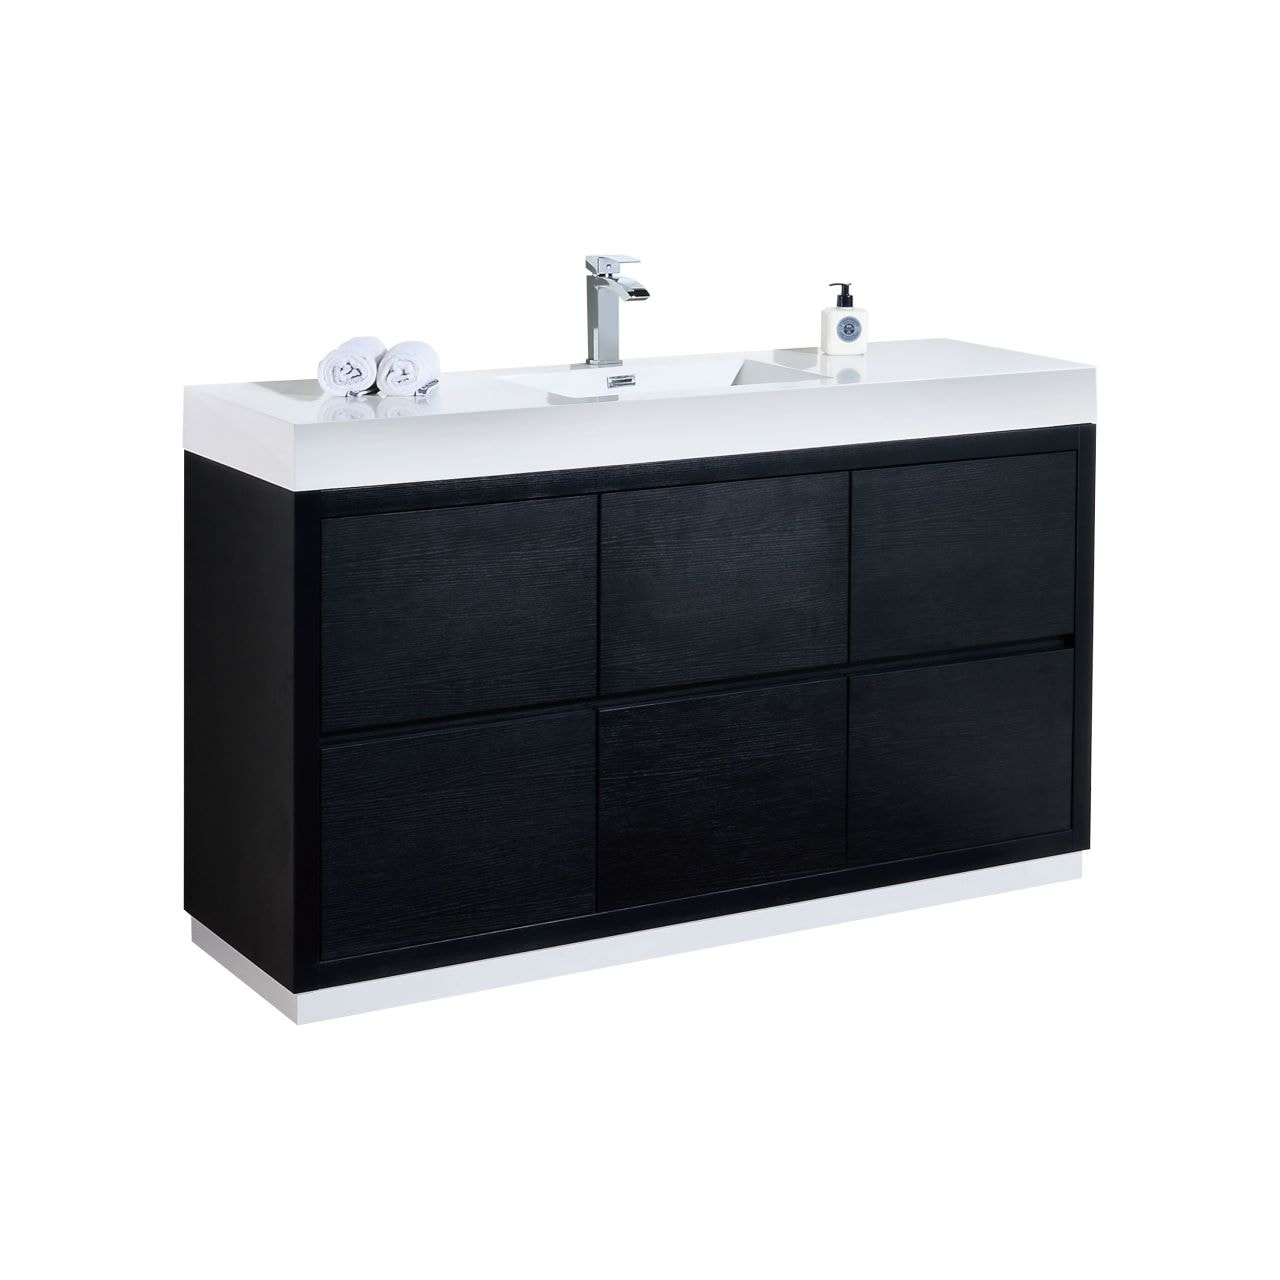 Shop Bliss 60 Single Sink Black Free Standing Modern Bathroom Vanity Overstock 30766787